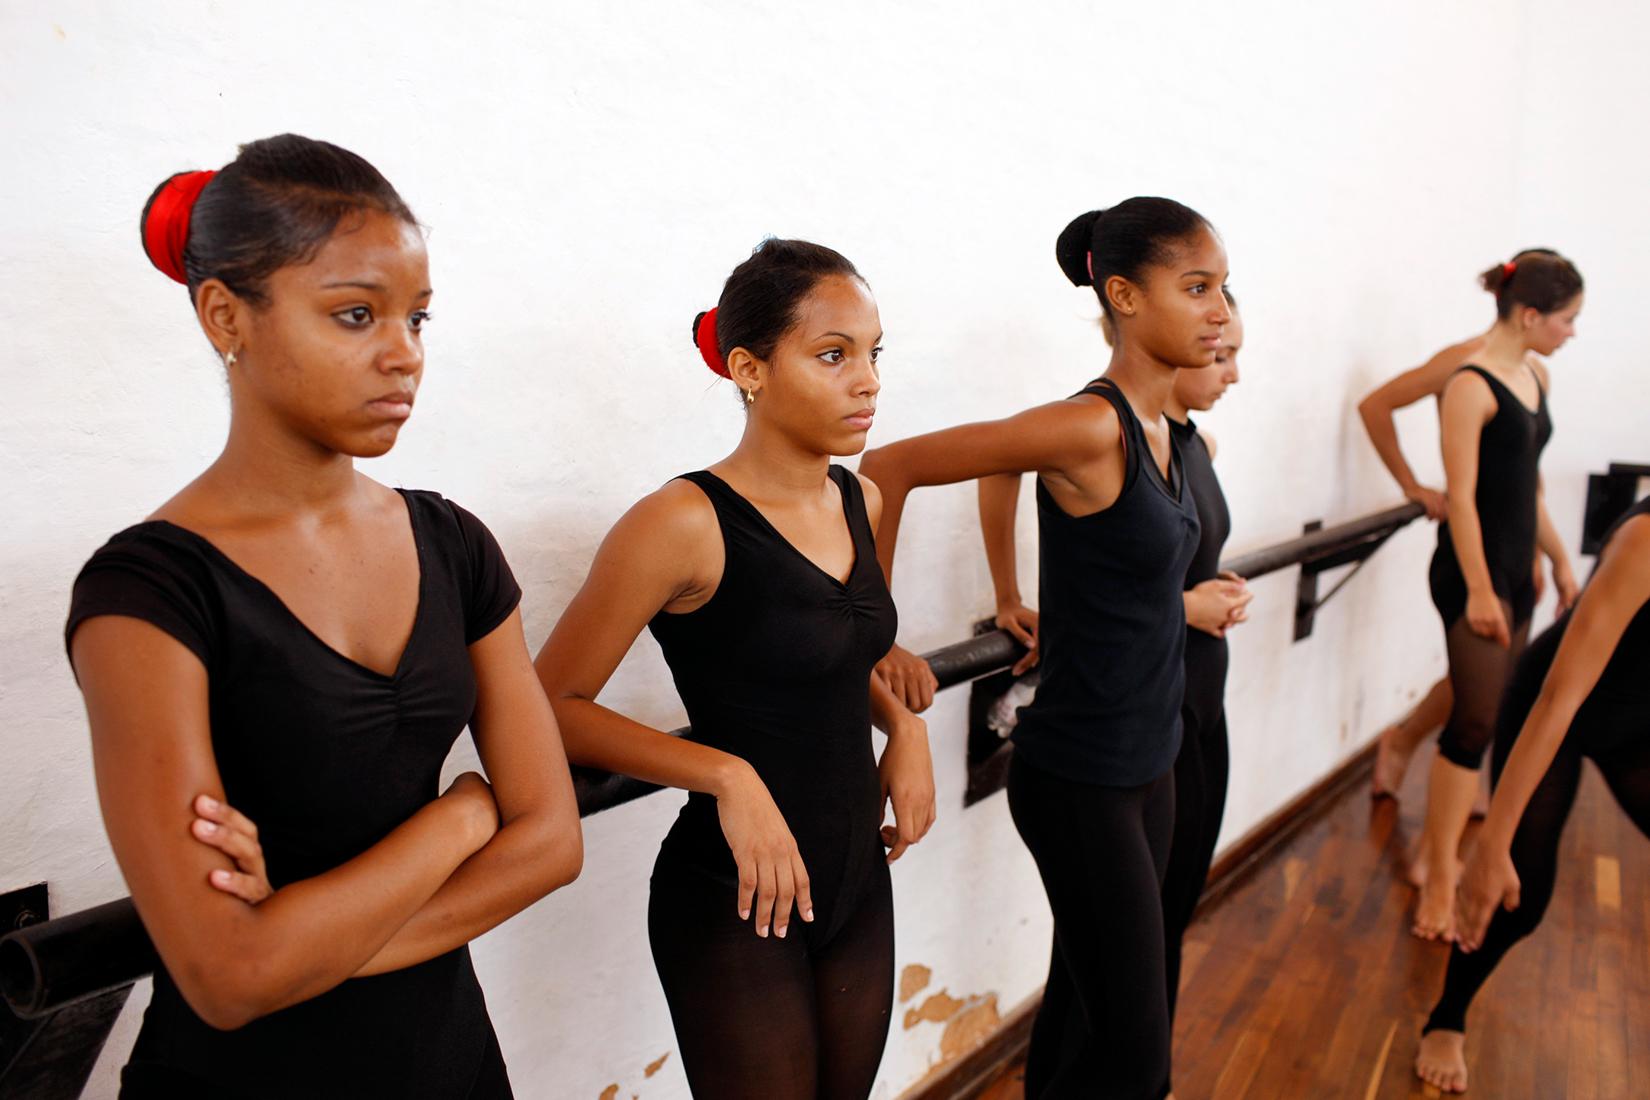 National School of Arts in Cuba